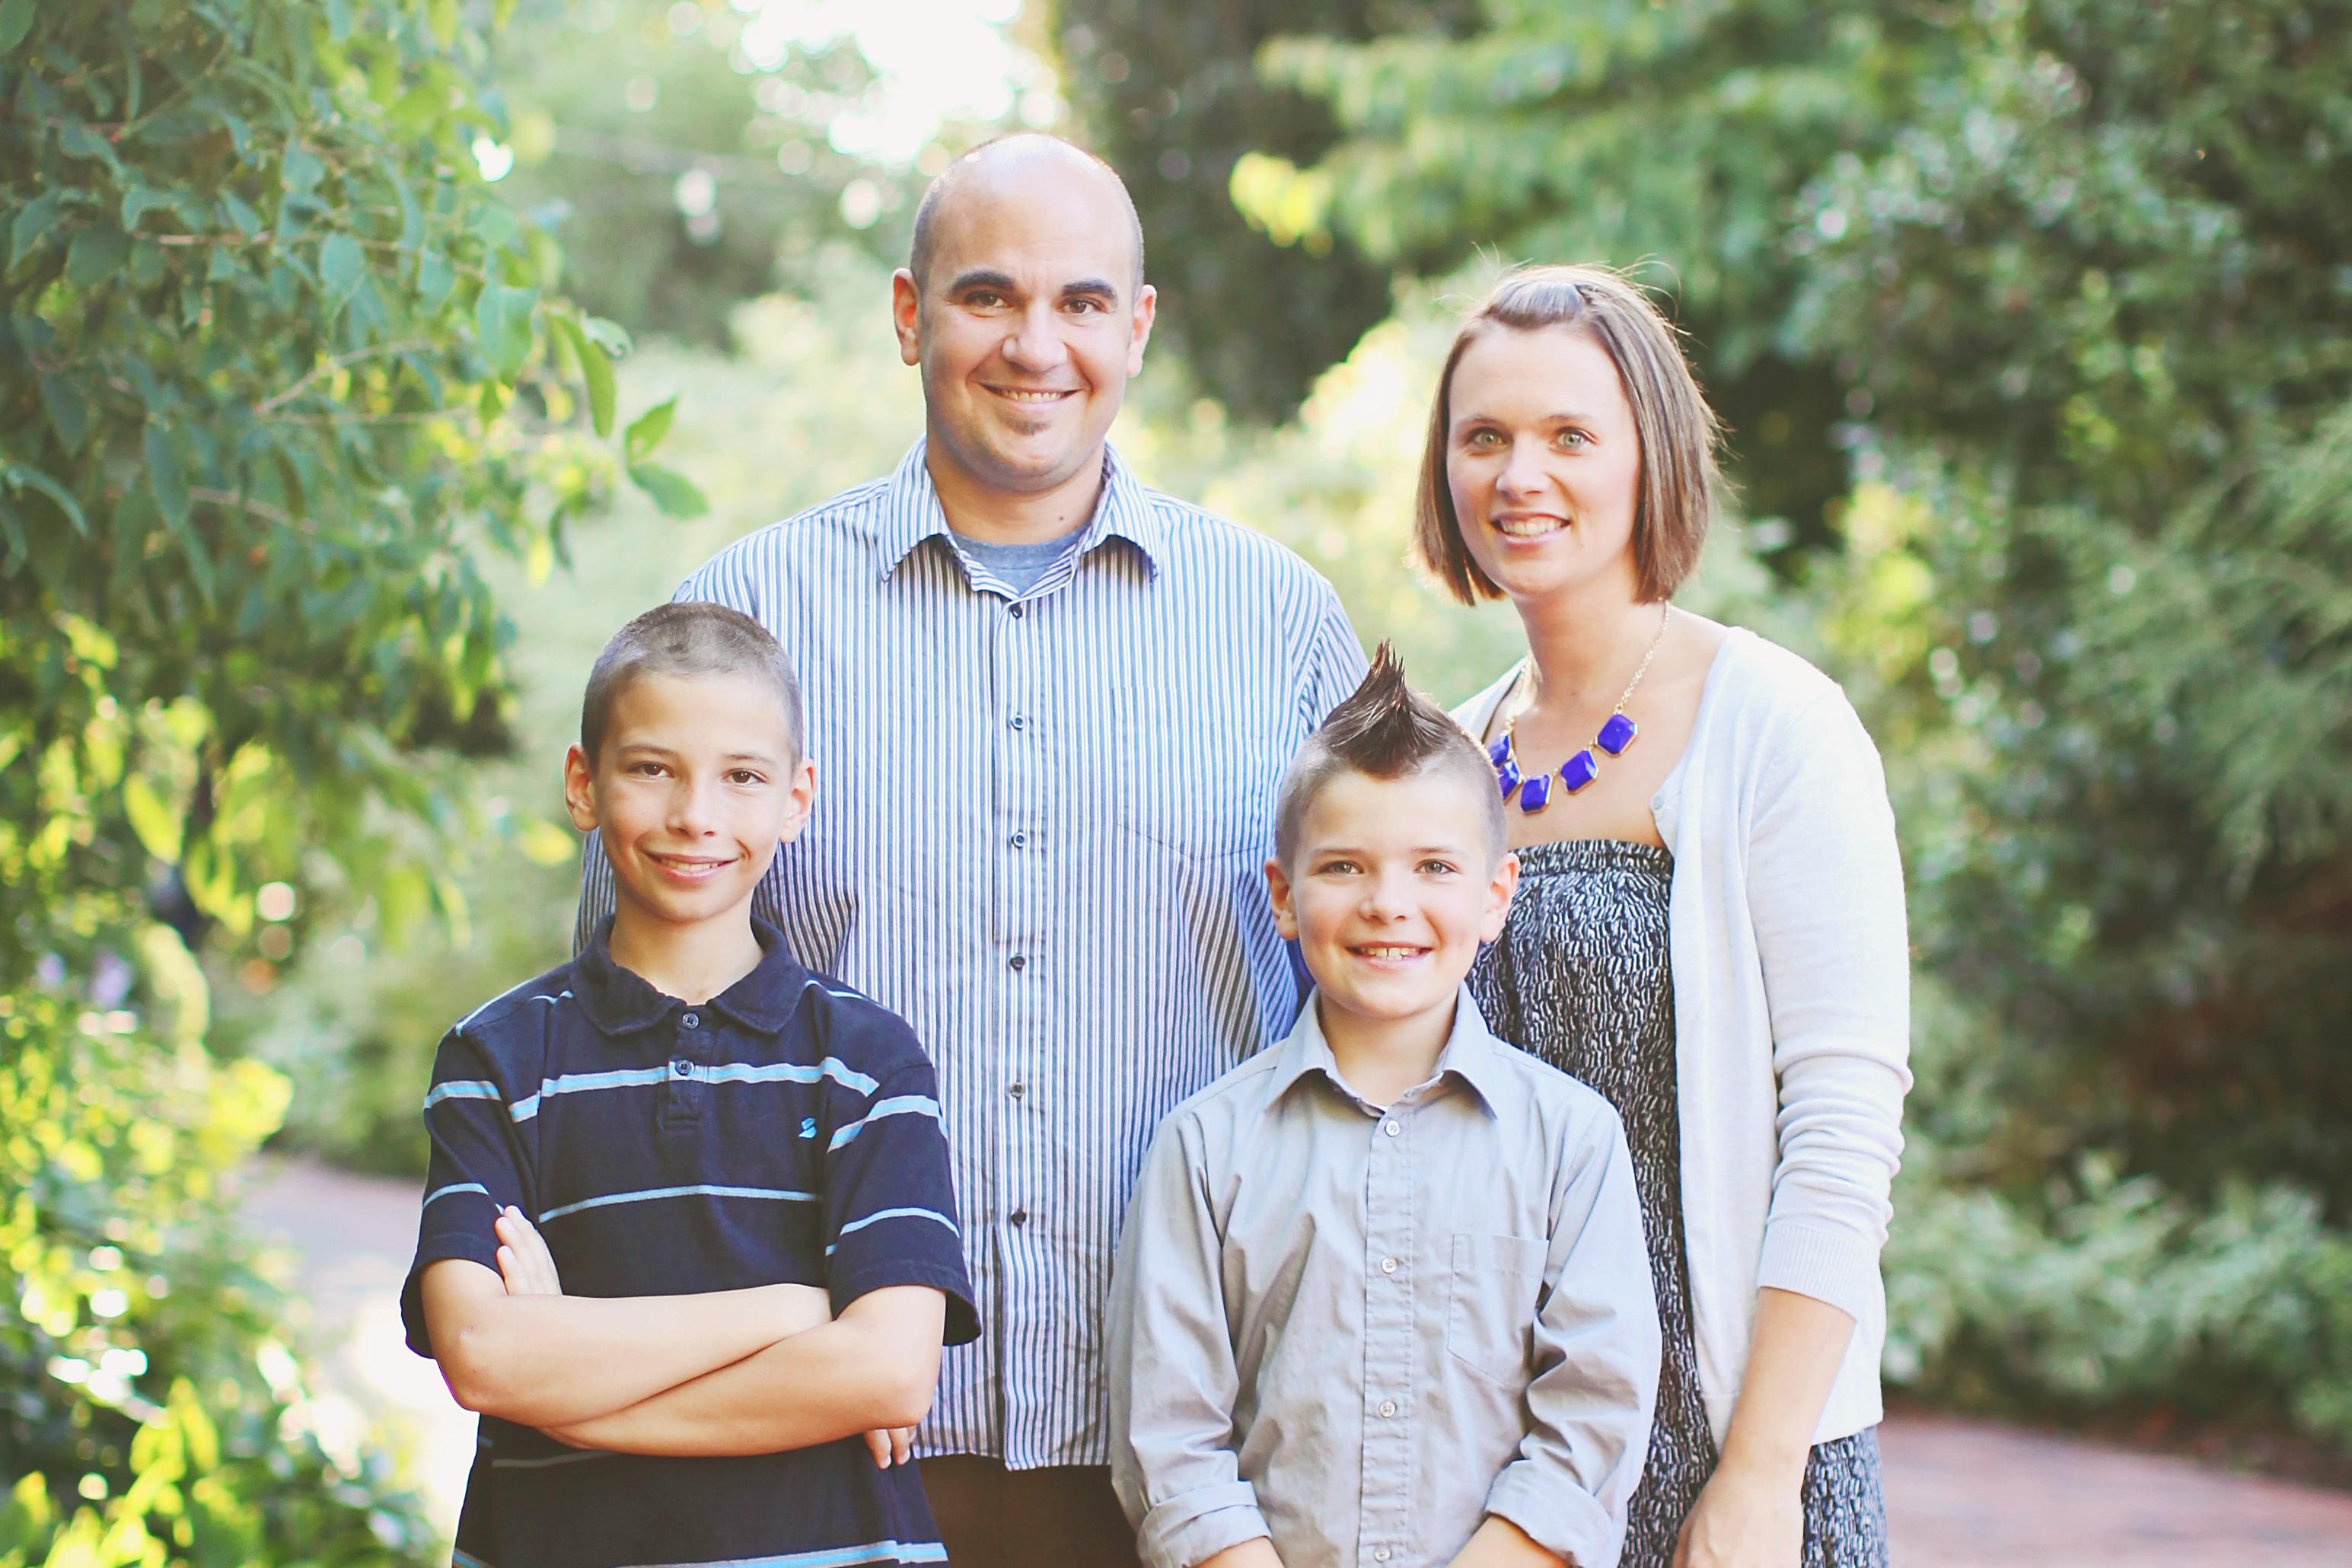 Stump family